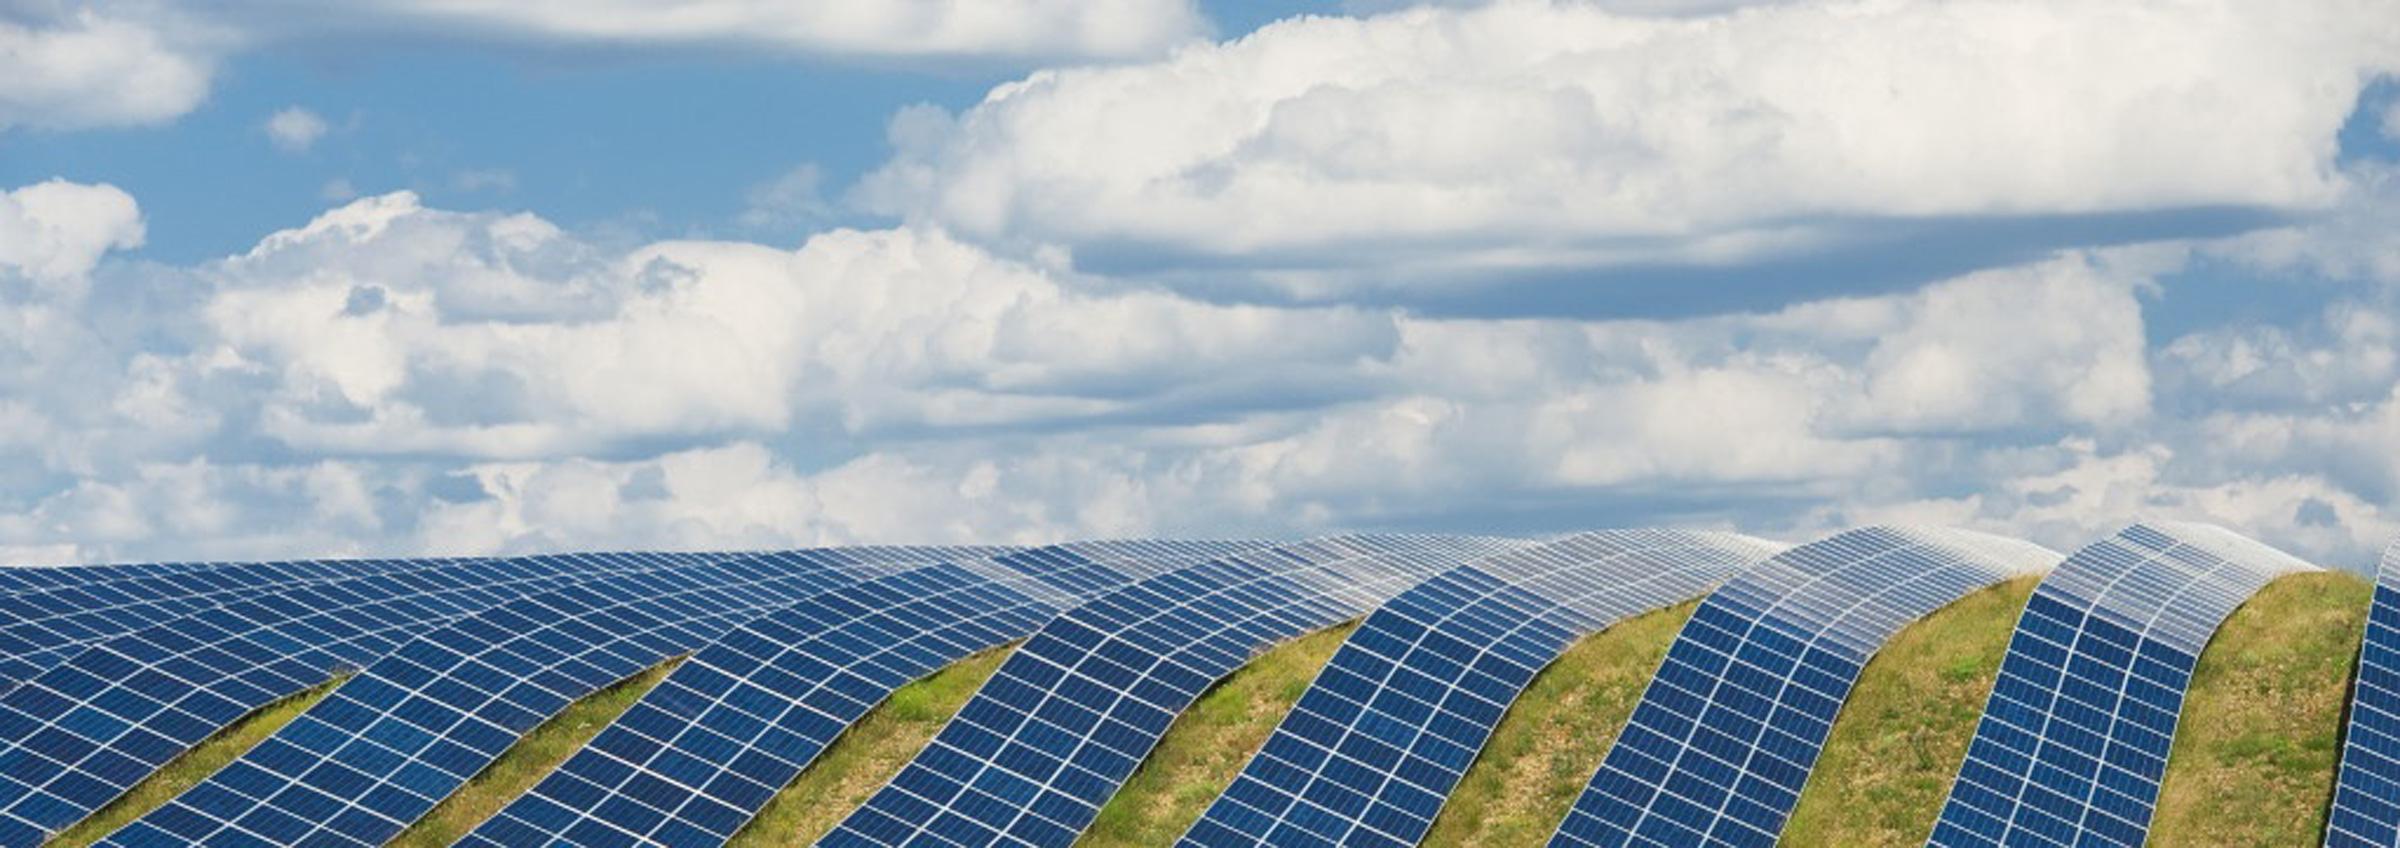 MAGNITUDE solar panels